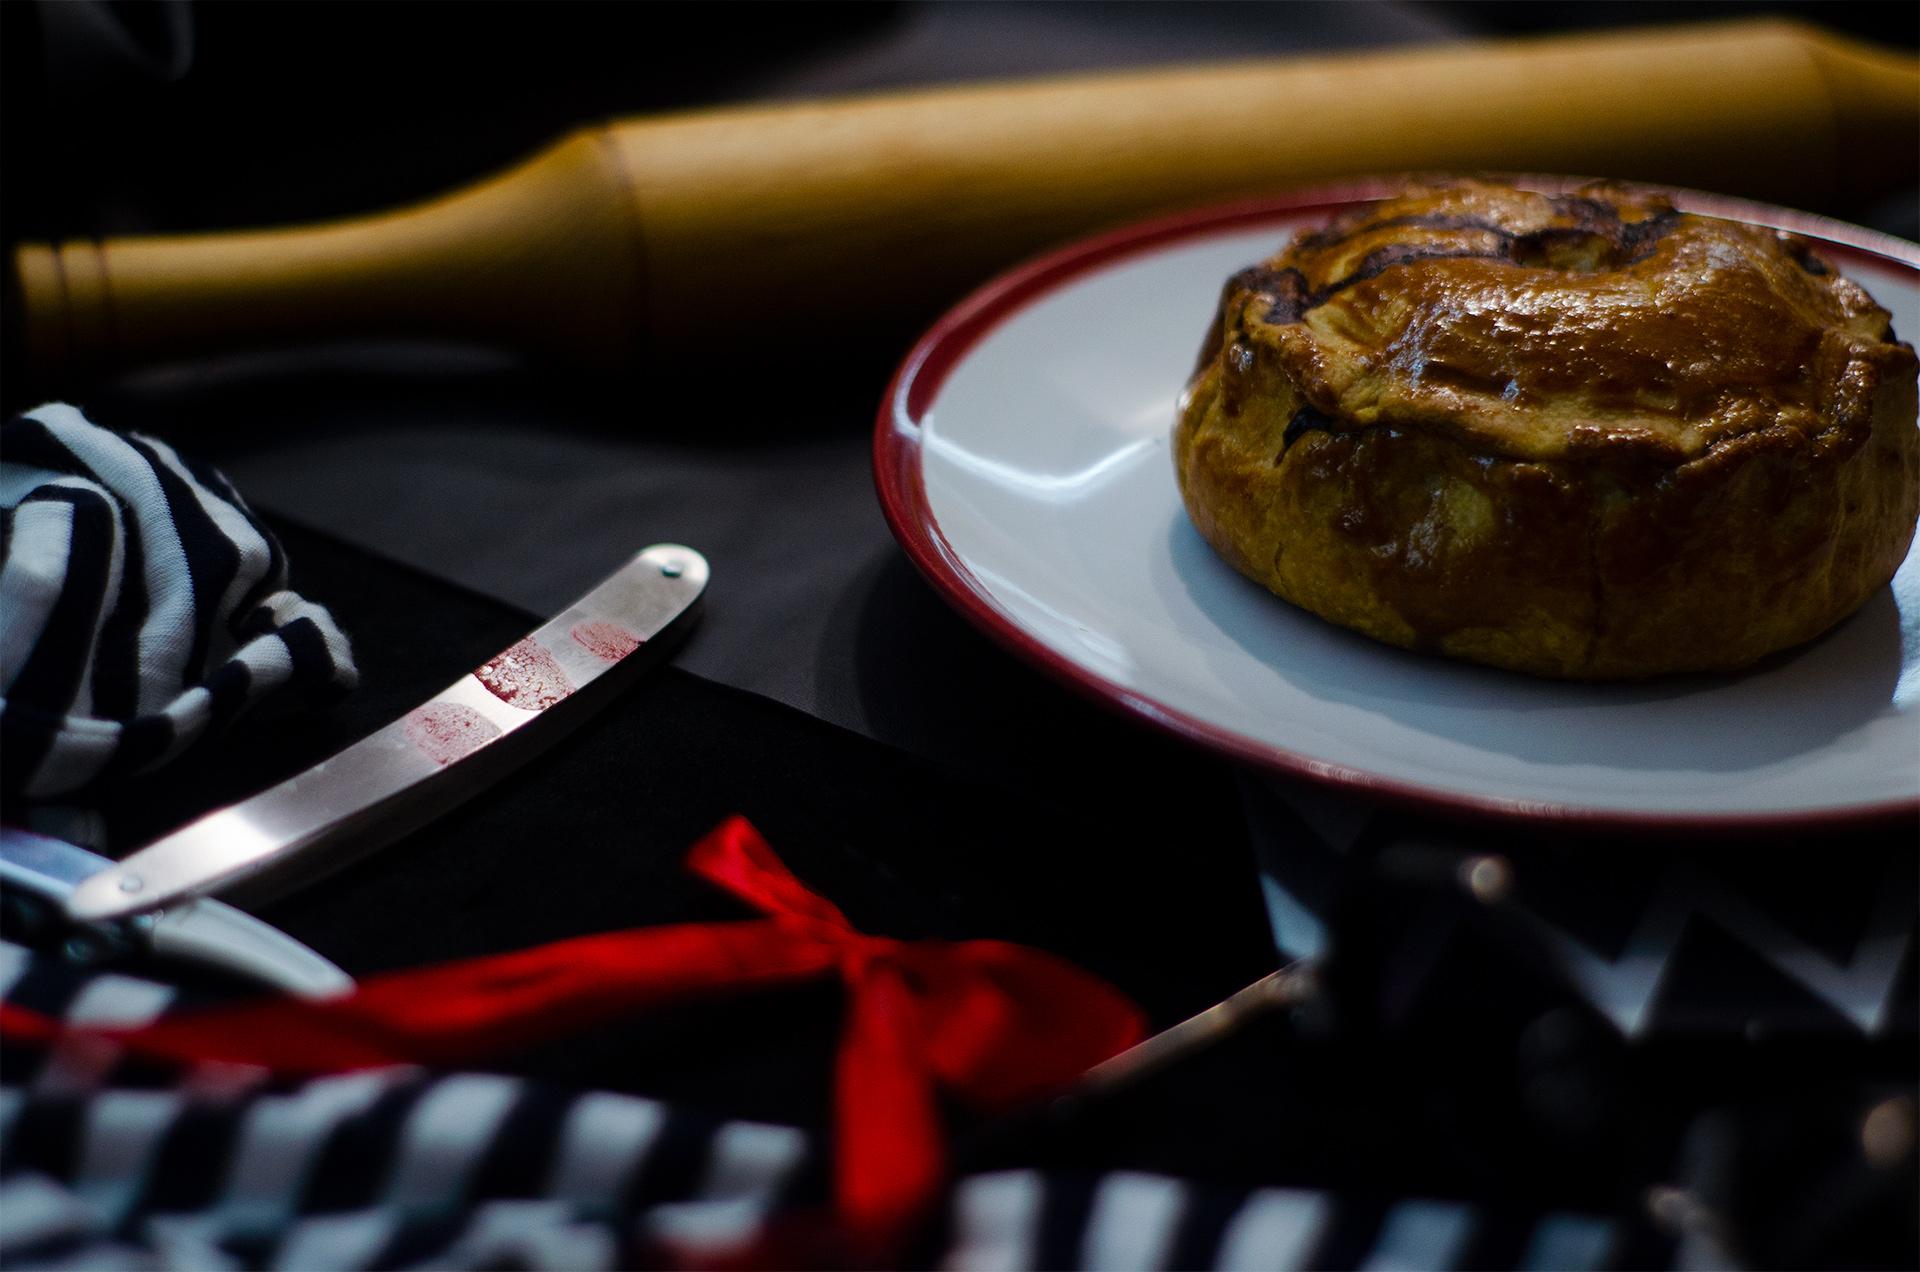 Mrs. Lovett's Pies from The Sweeney Todd: The Demon Barber of Fleet Street